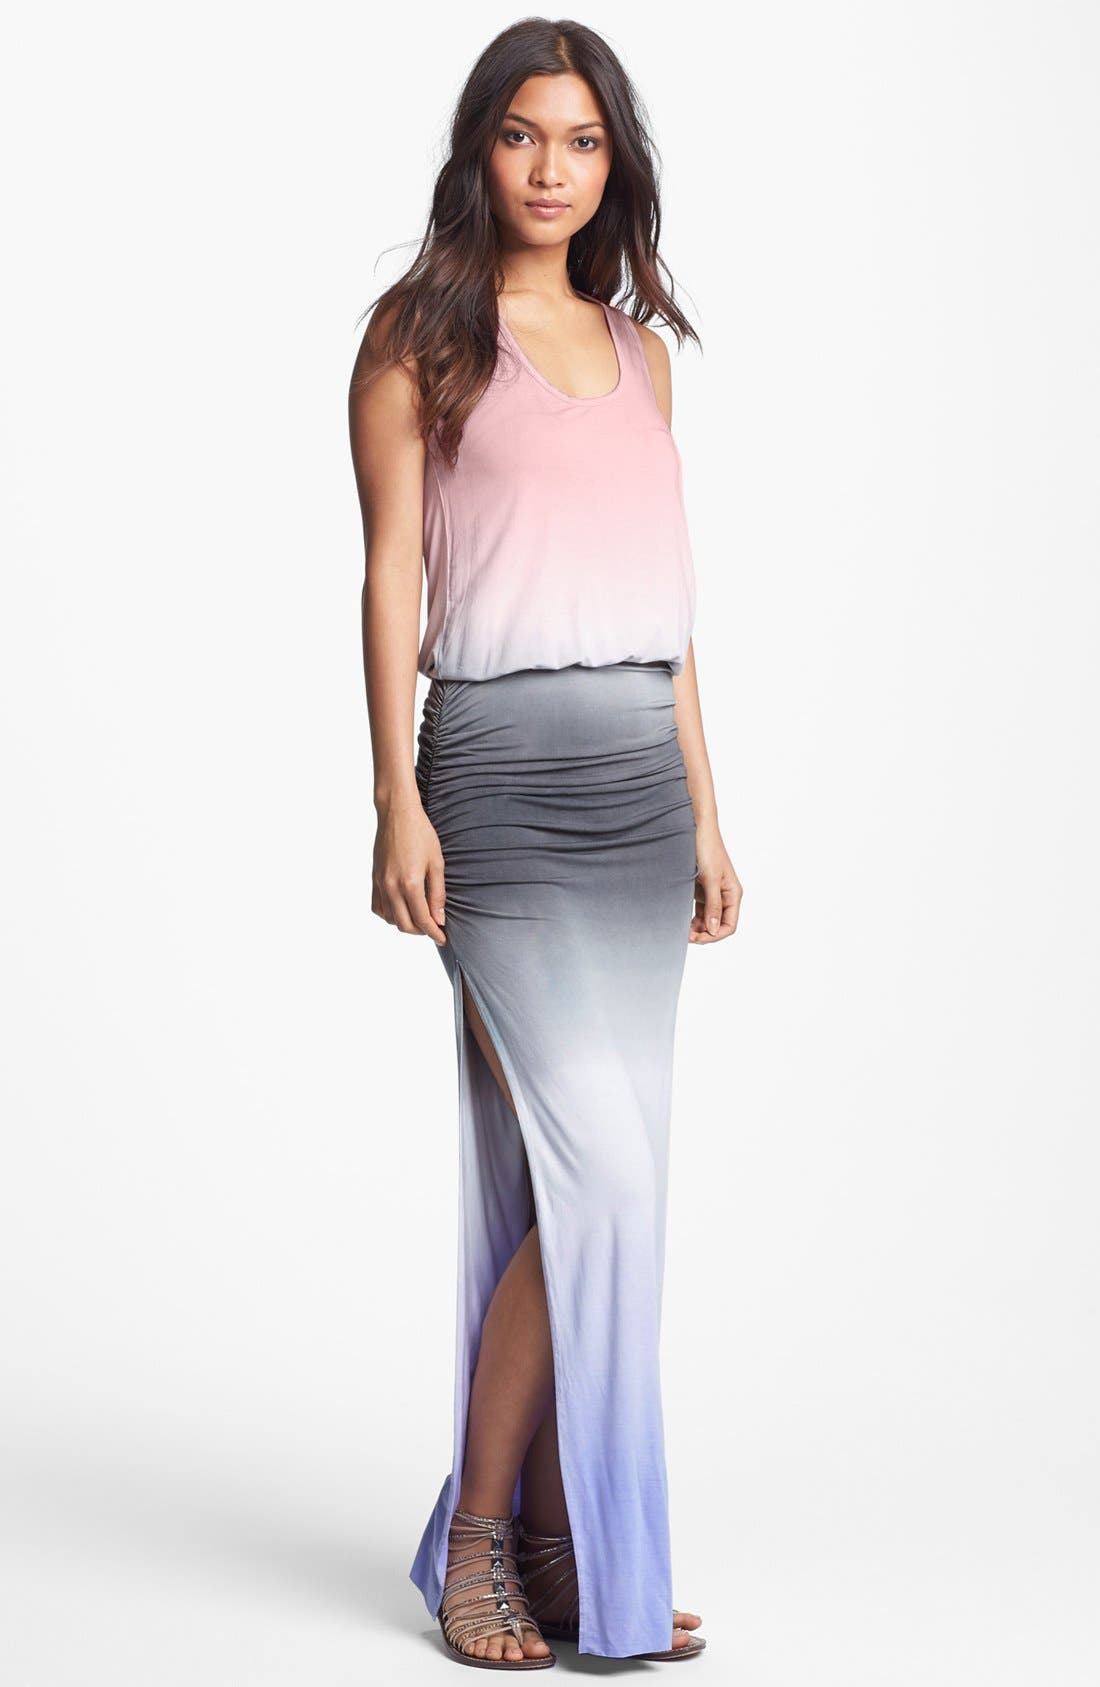 Alternate Image 1 Selected - Young, Fabulous & Broke 'Mel' Maxi Dress